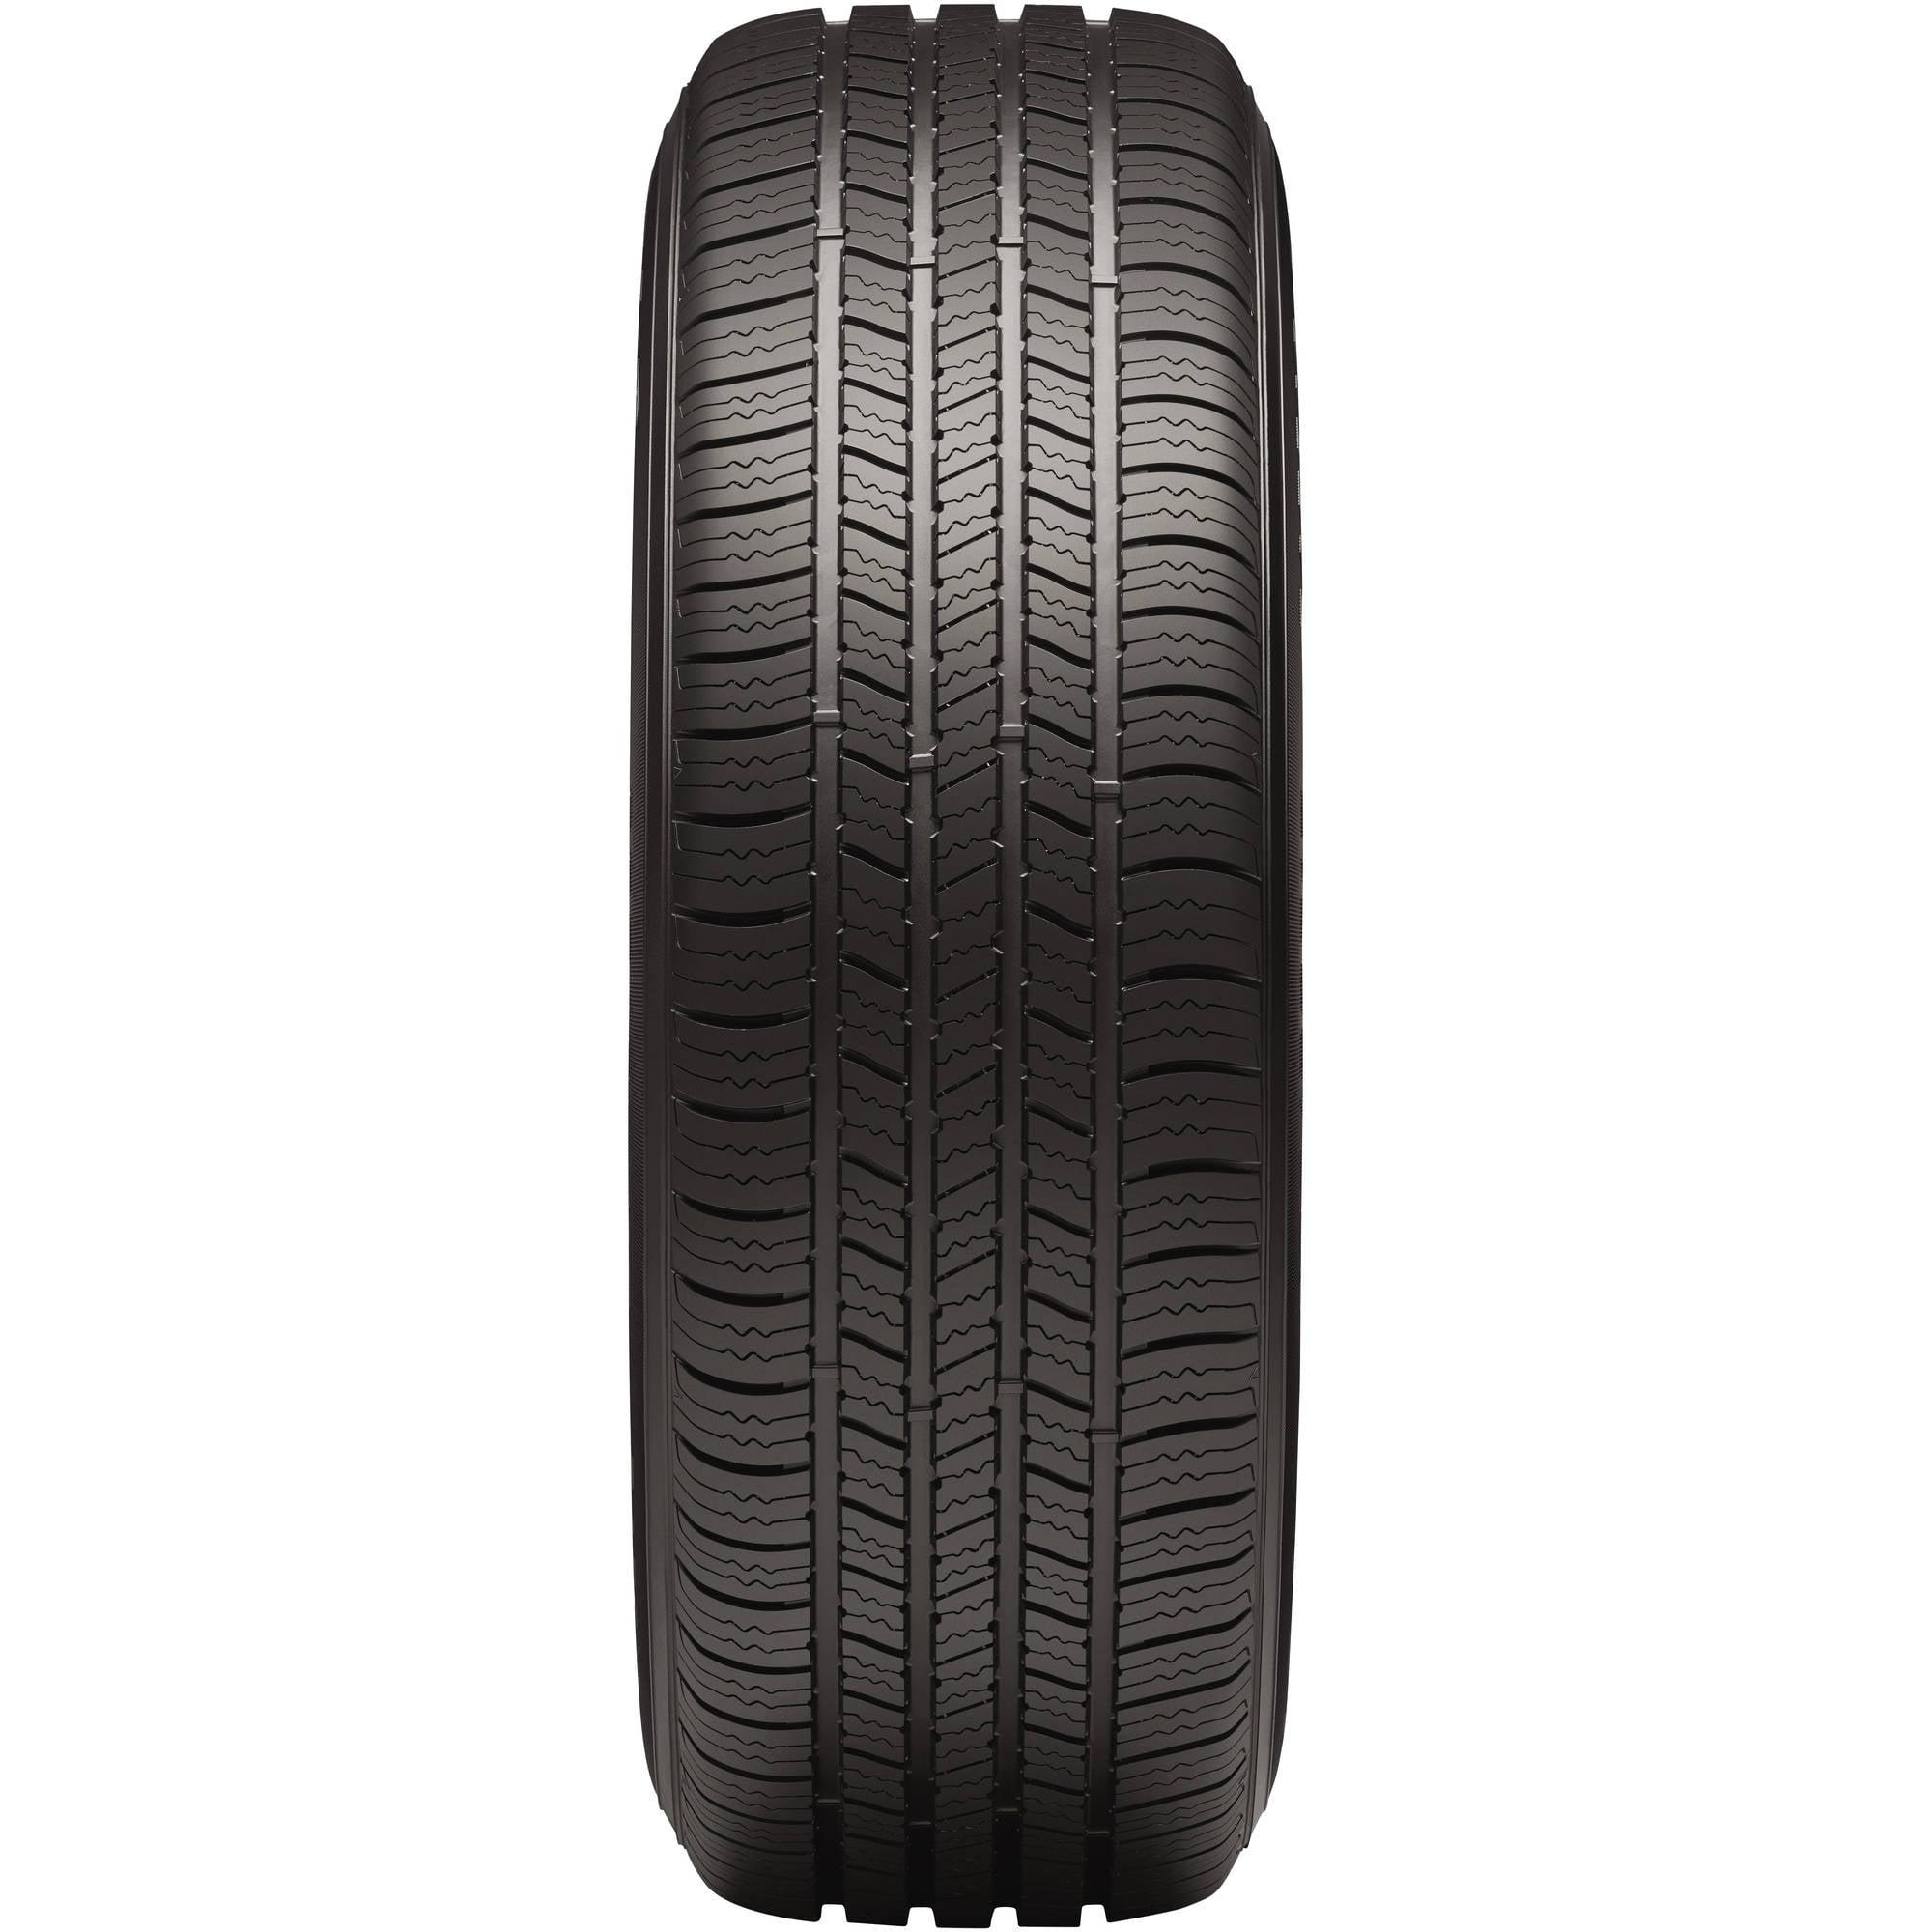 Goodyear Viva 3 All Season Tire 235 60r16 100t Walmart Com